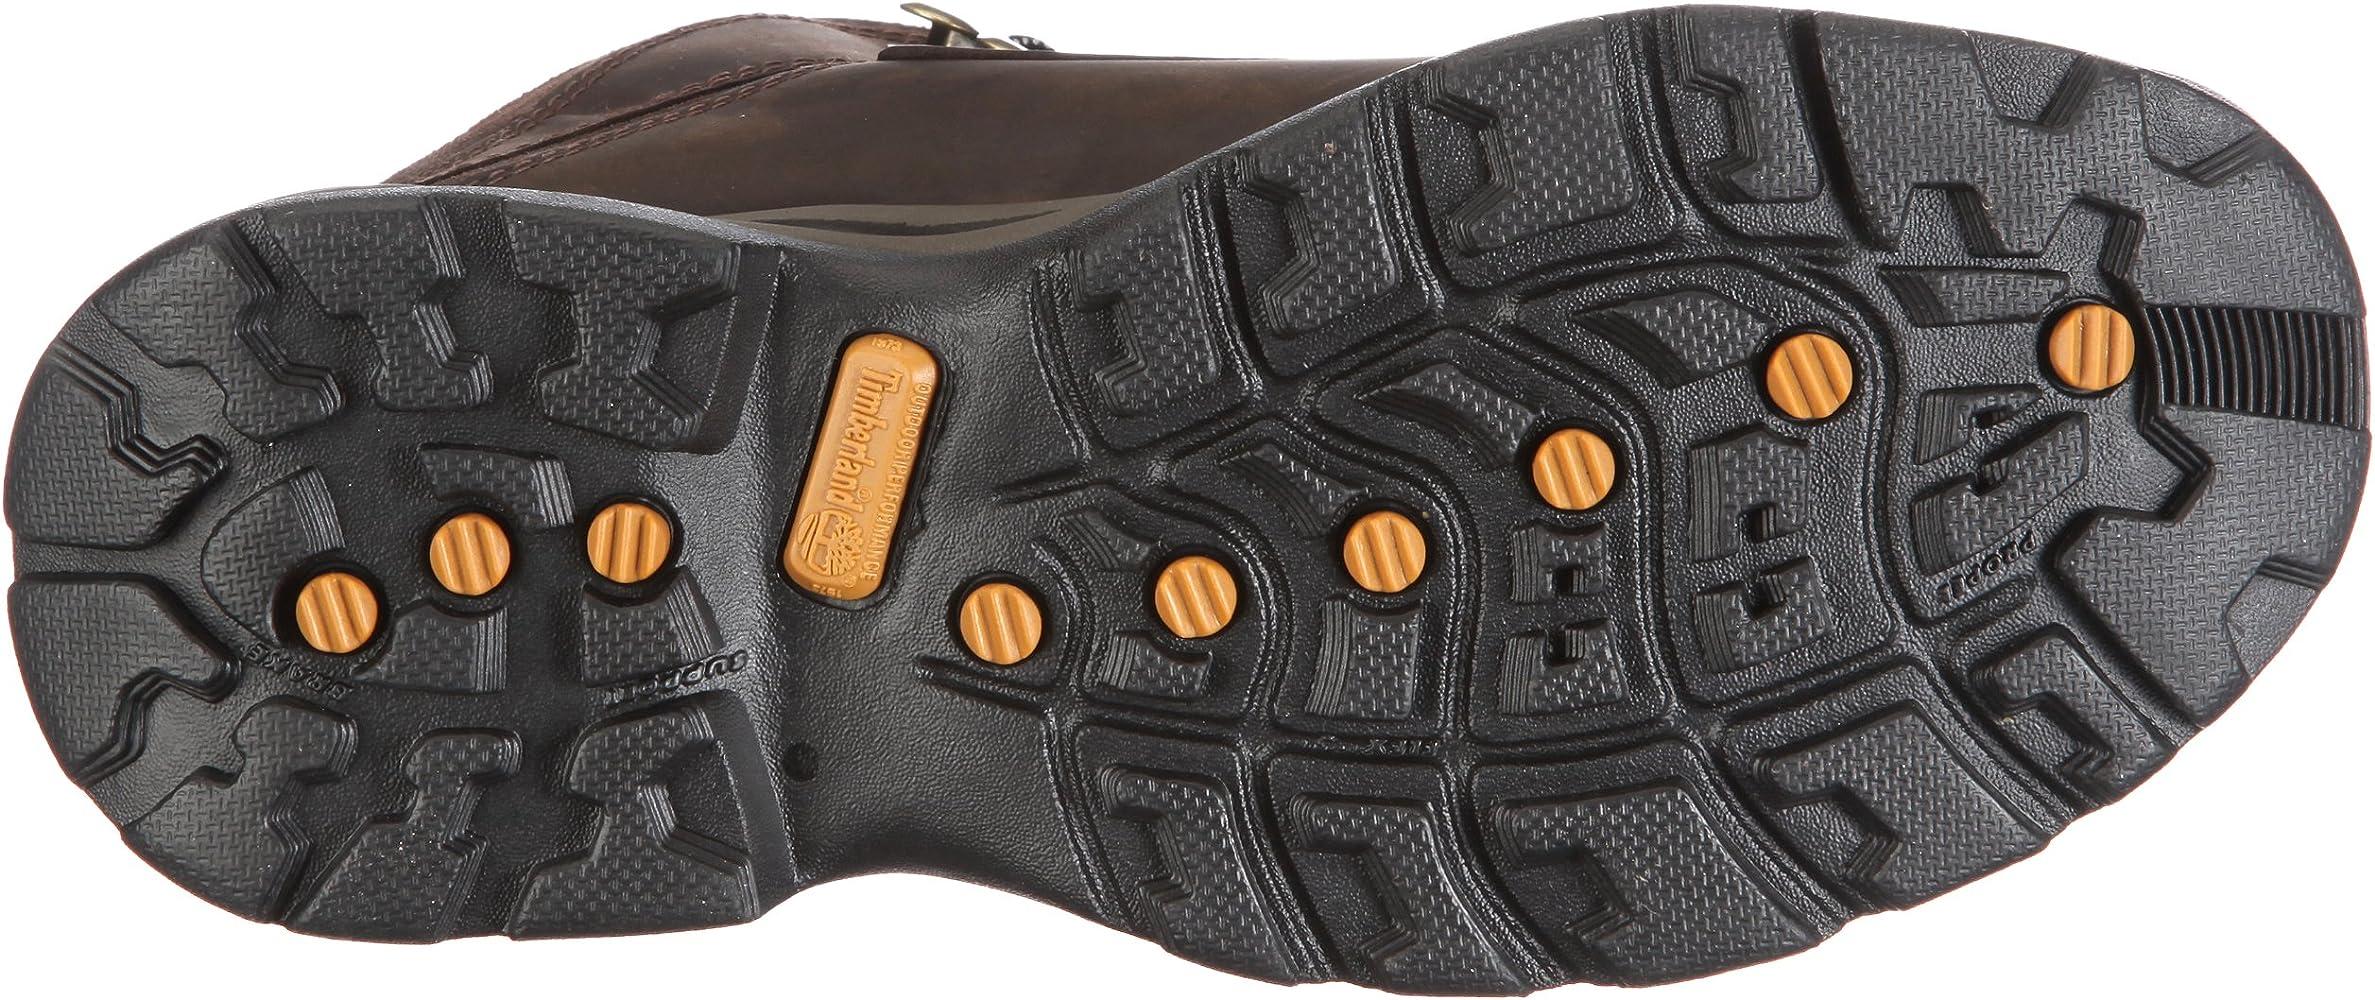 Timberland WHITELEDGE WP 12668, Chaussures de randonnée